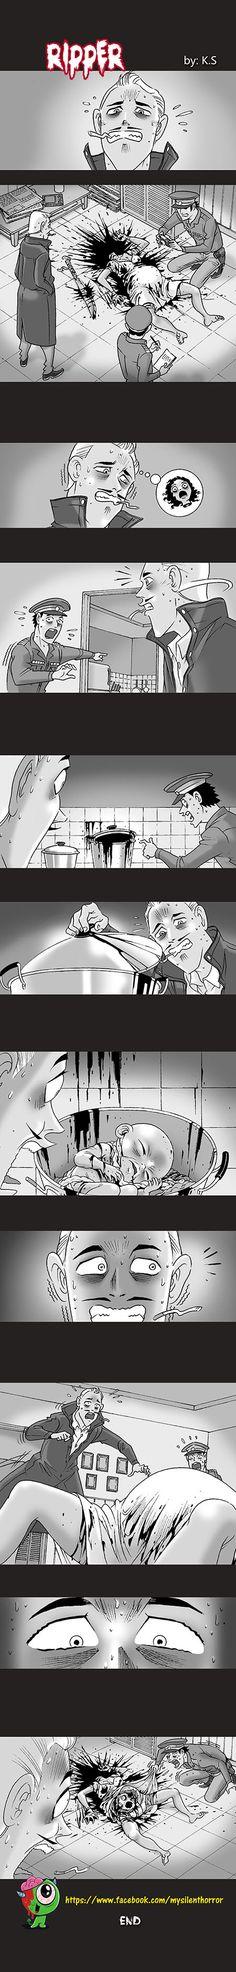 Ripper - image